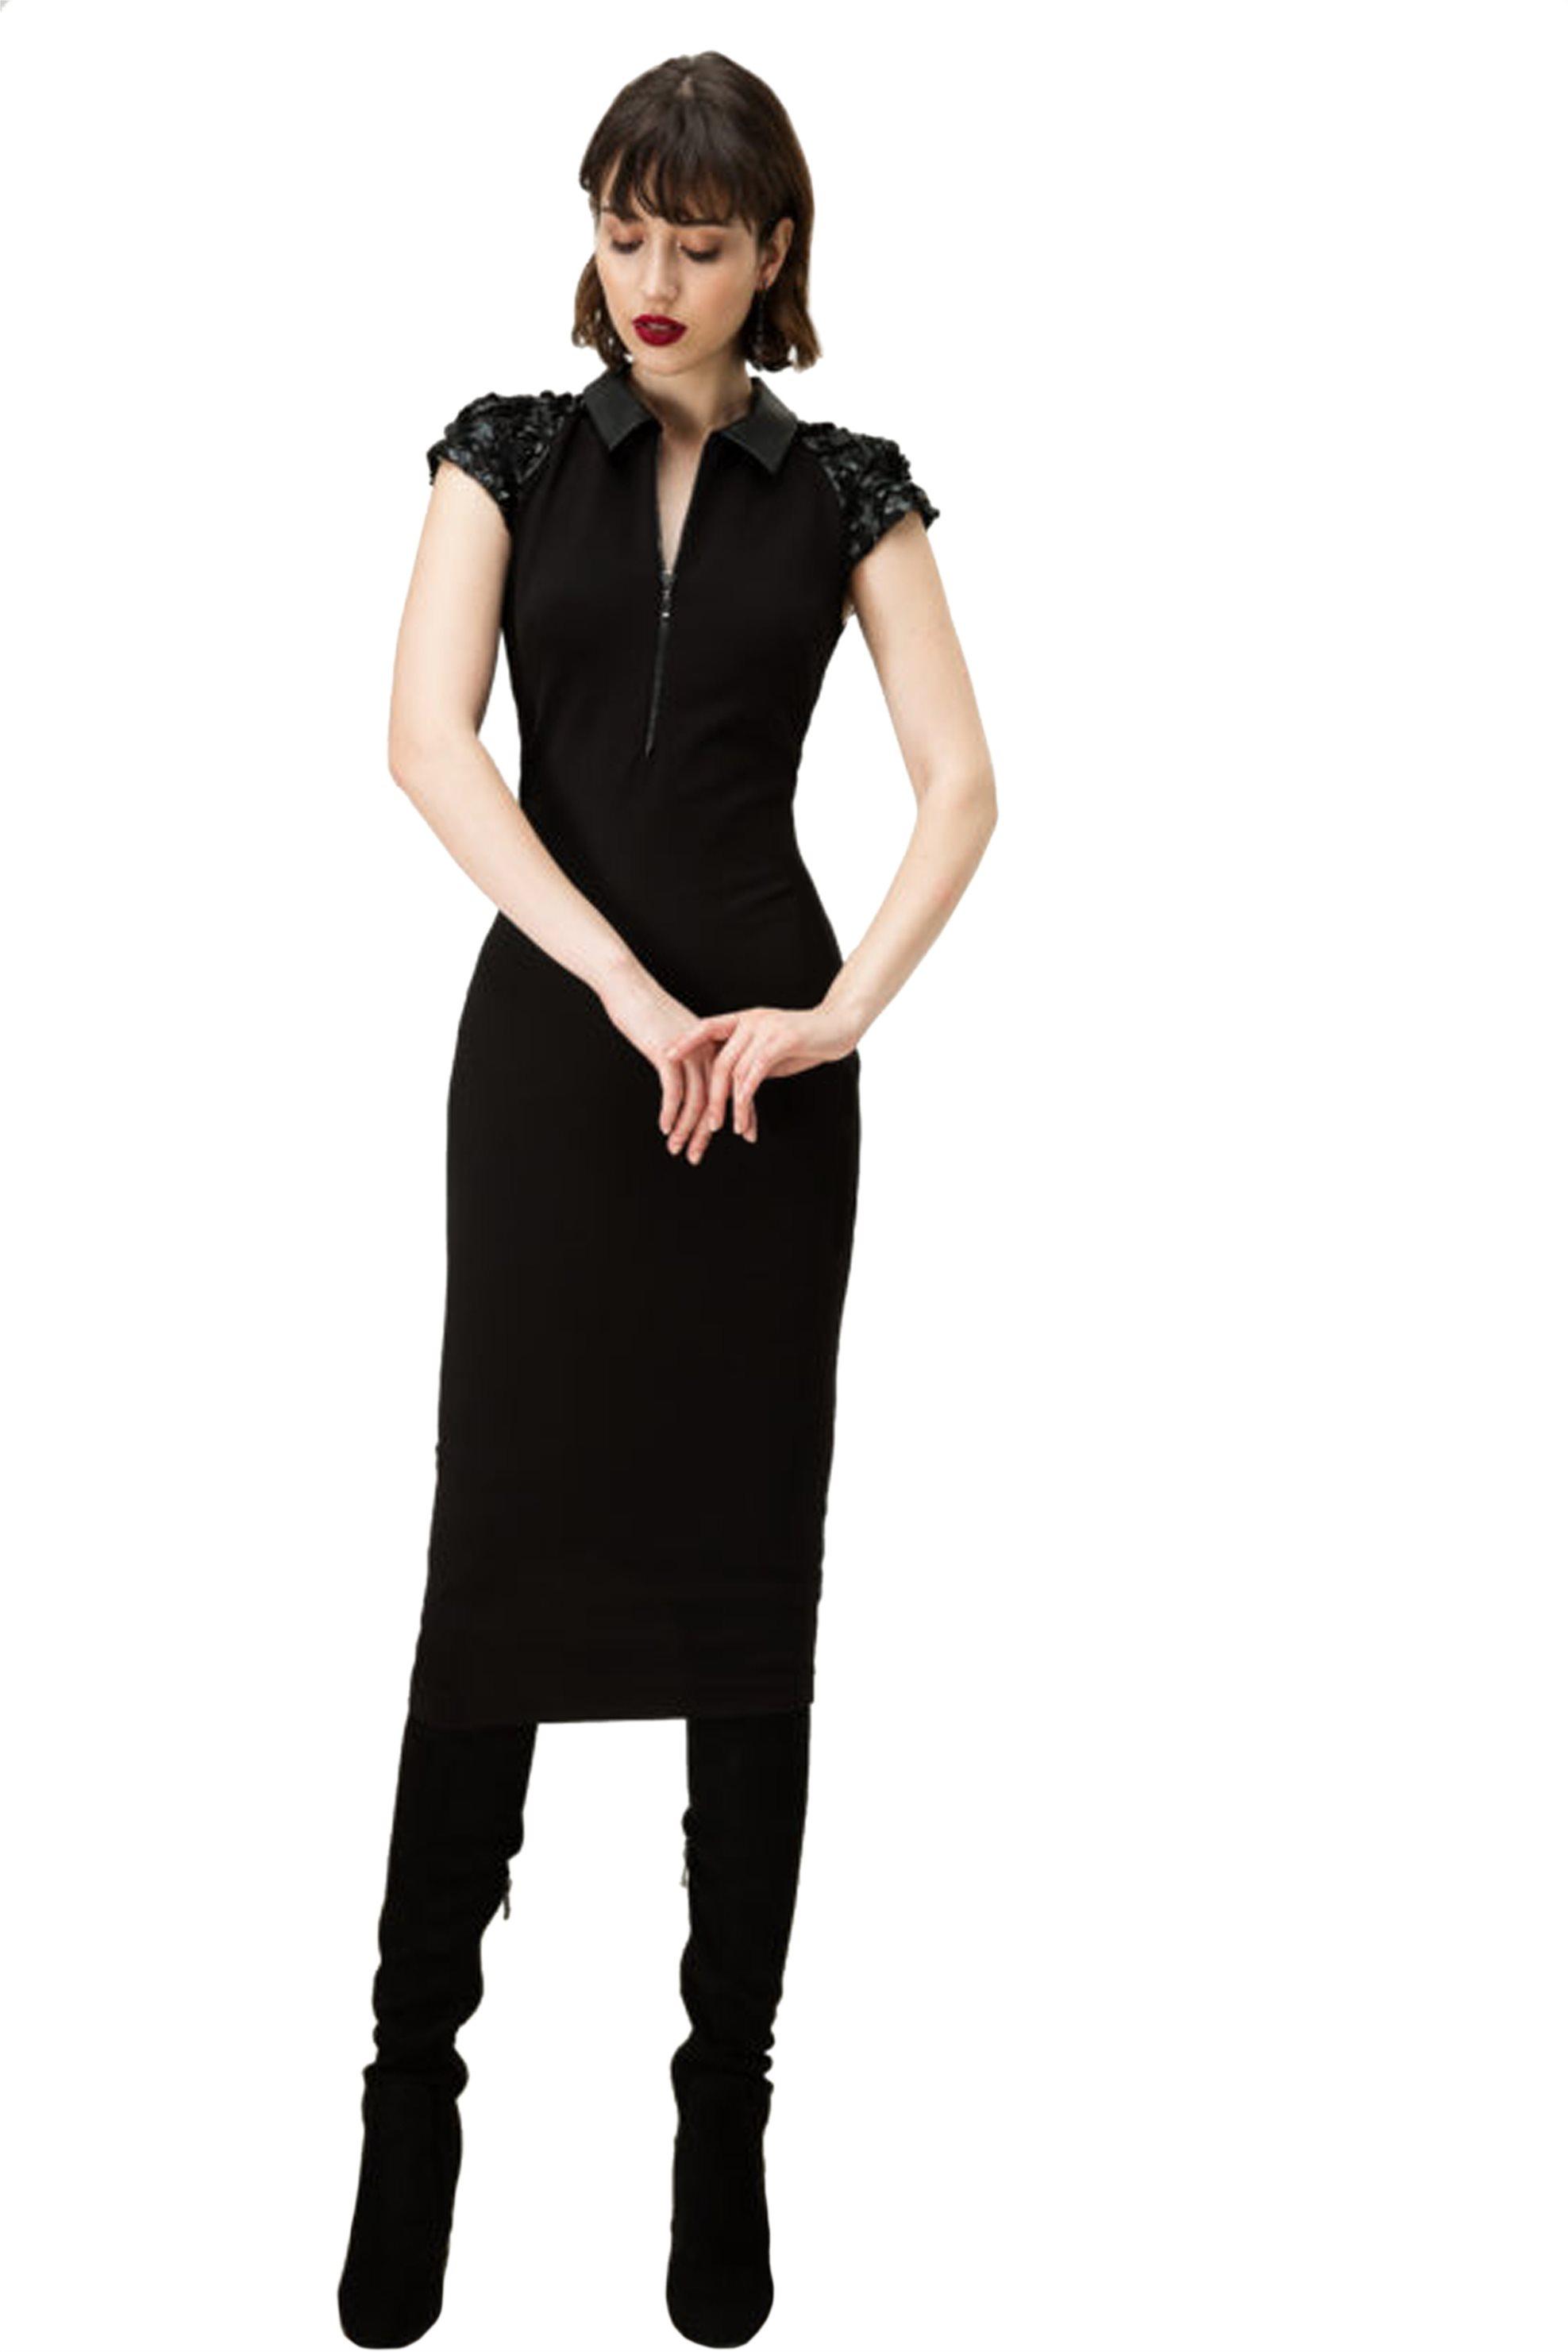 Billy Sabbado γυναικείο μίντι φόρεμα με faux leather λεπτομέρειες - 0192966686 - γυναικα   ρουχα   φορέματα   midi φορέματα